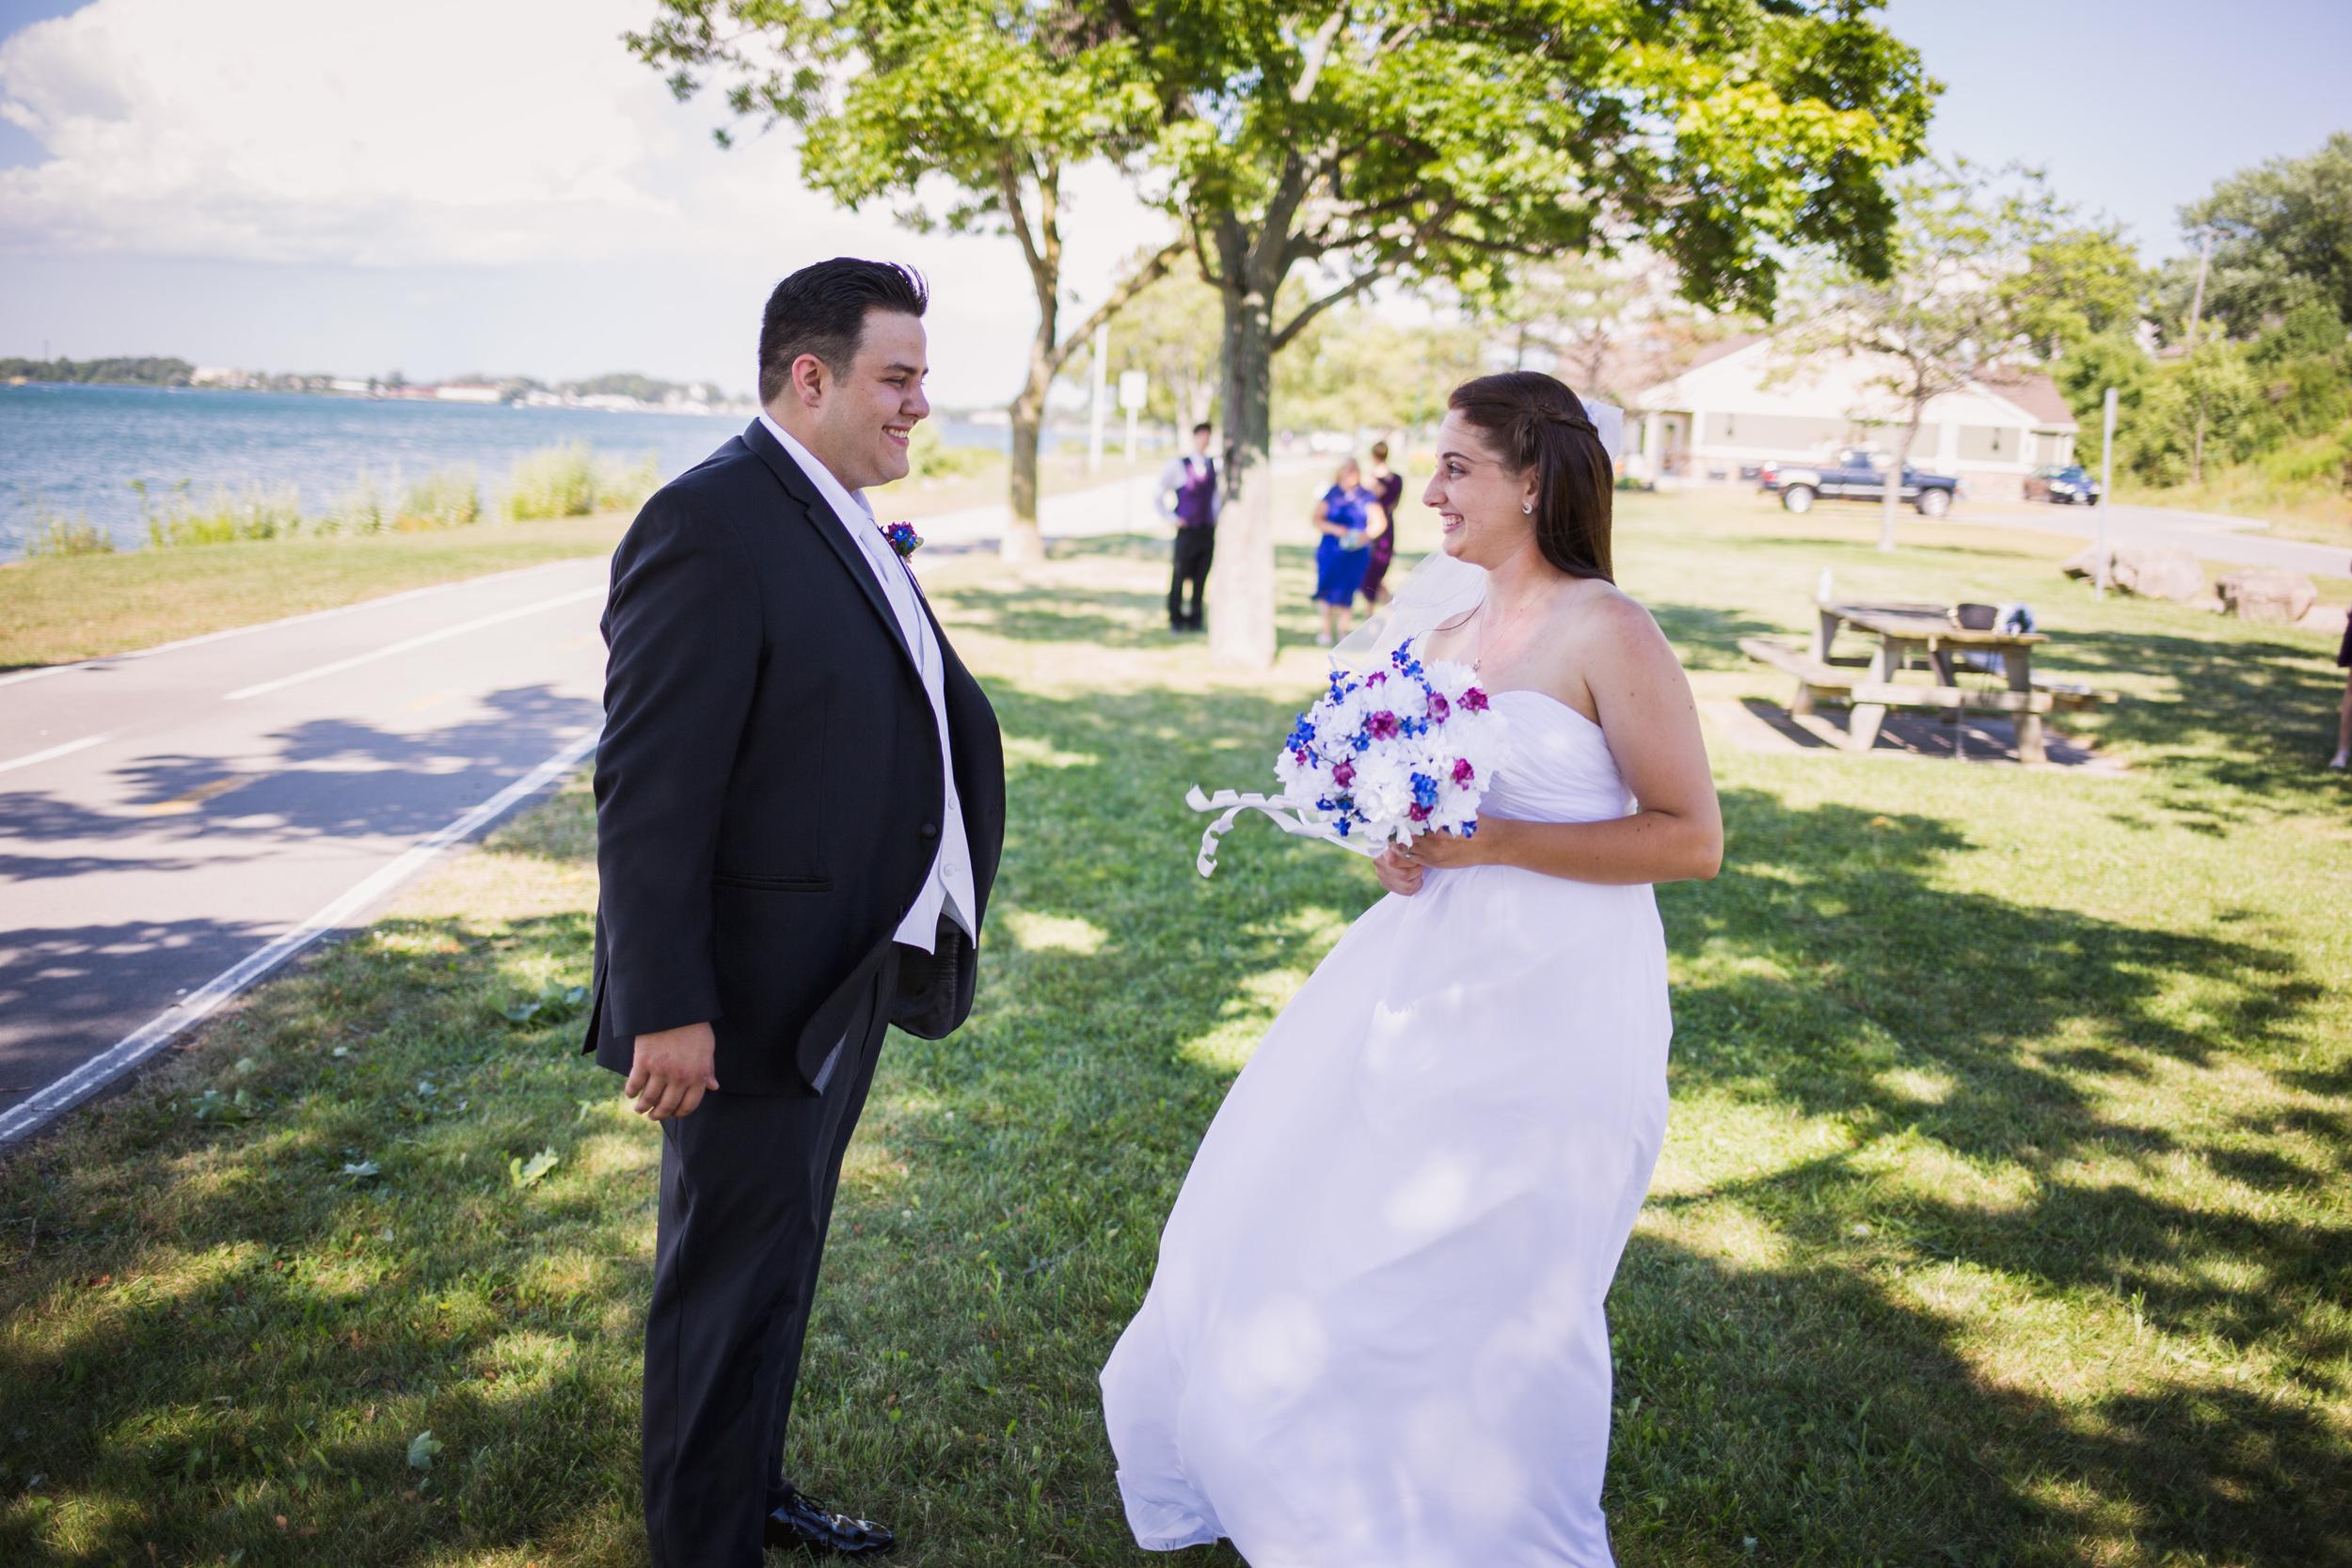 Stephanie-and-Mitchell-Buffalo-NY-Wedding-Stefan-Ludwig-Photography-8.jpg